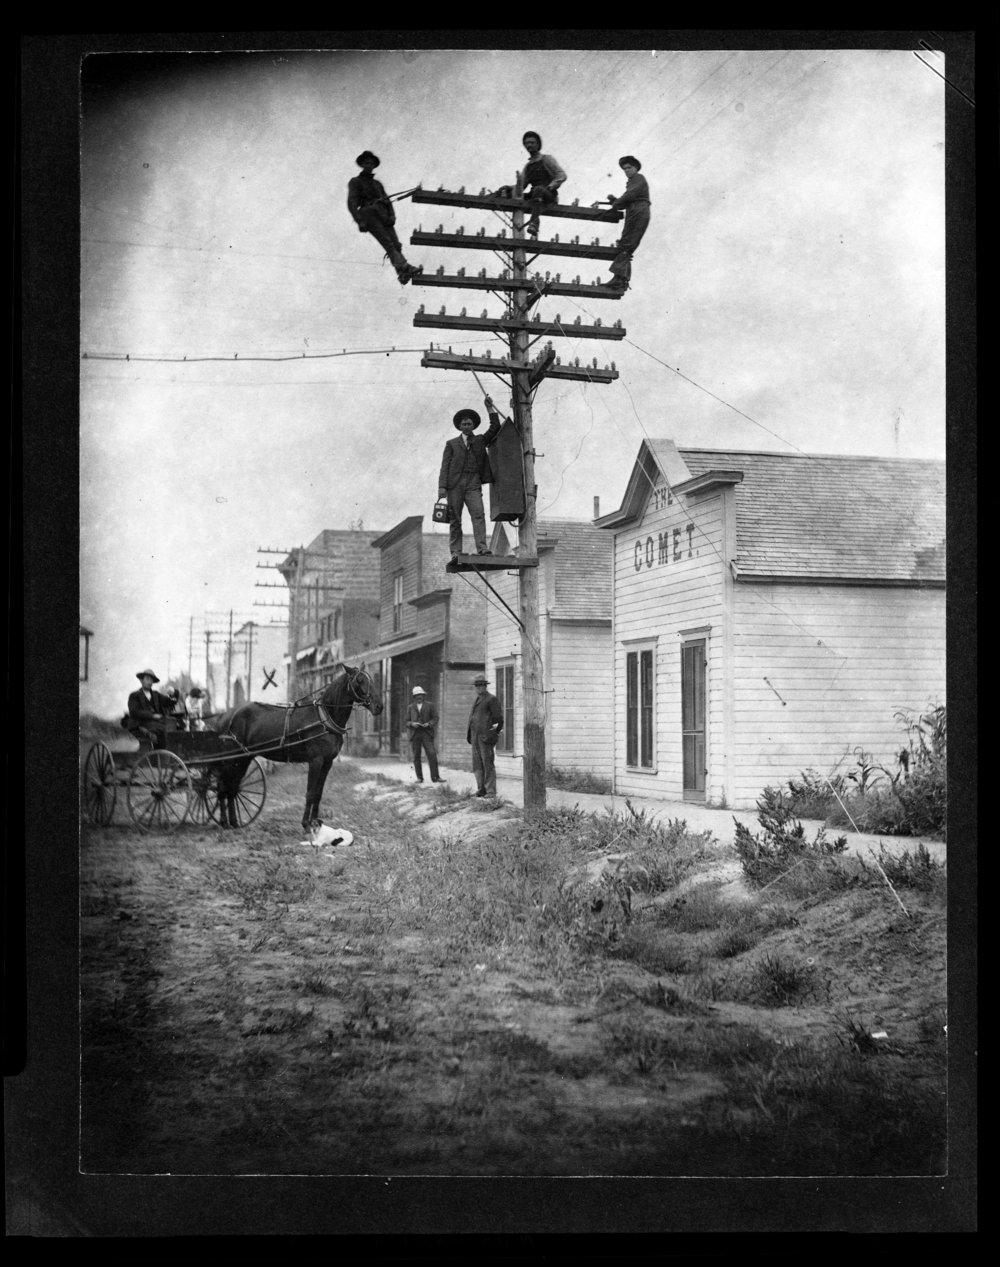 Telephone linemen, Courtland, Kansas